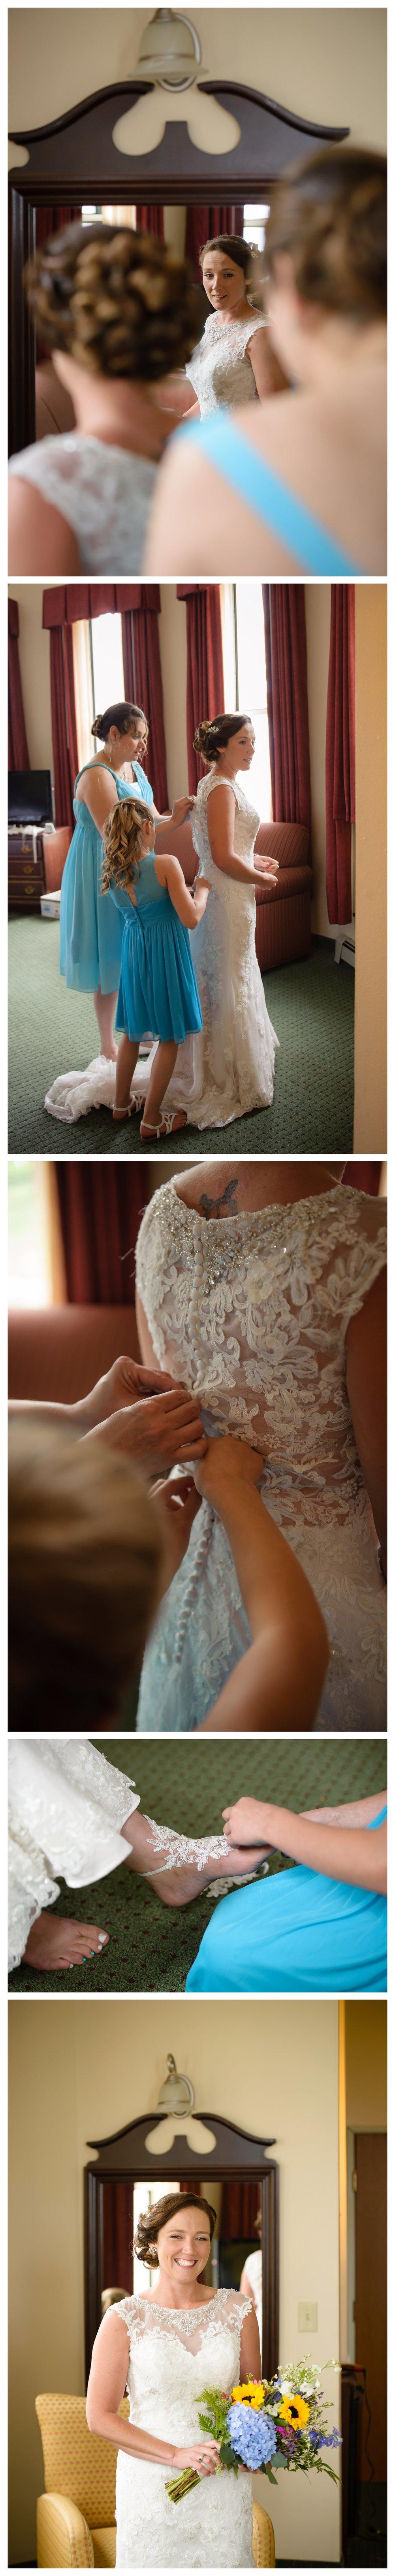 ps 139 photography jen jensen ashland freehands farm wedding northwoods_0022.jpg